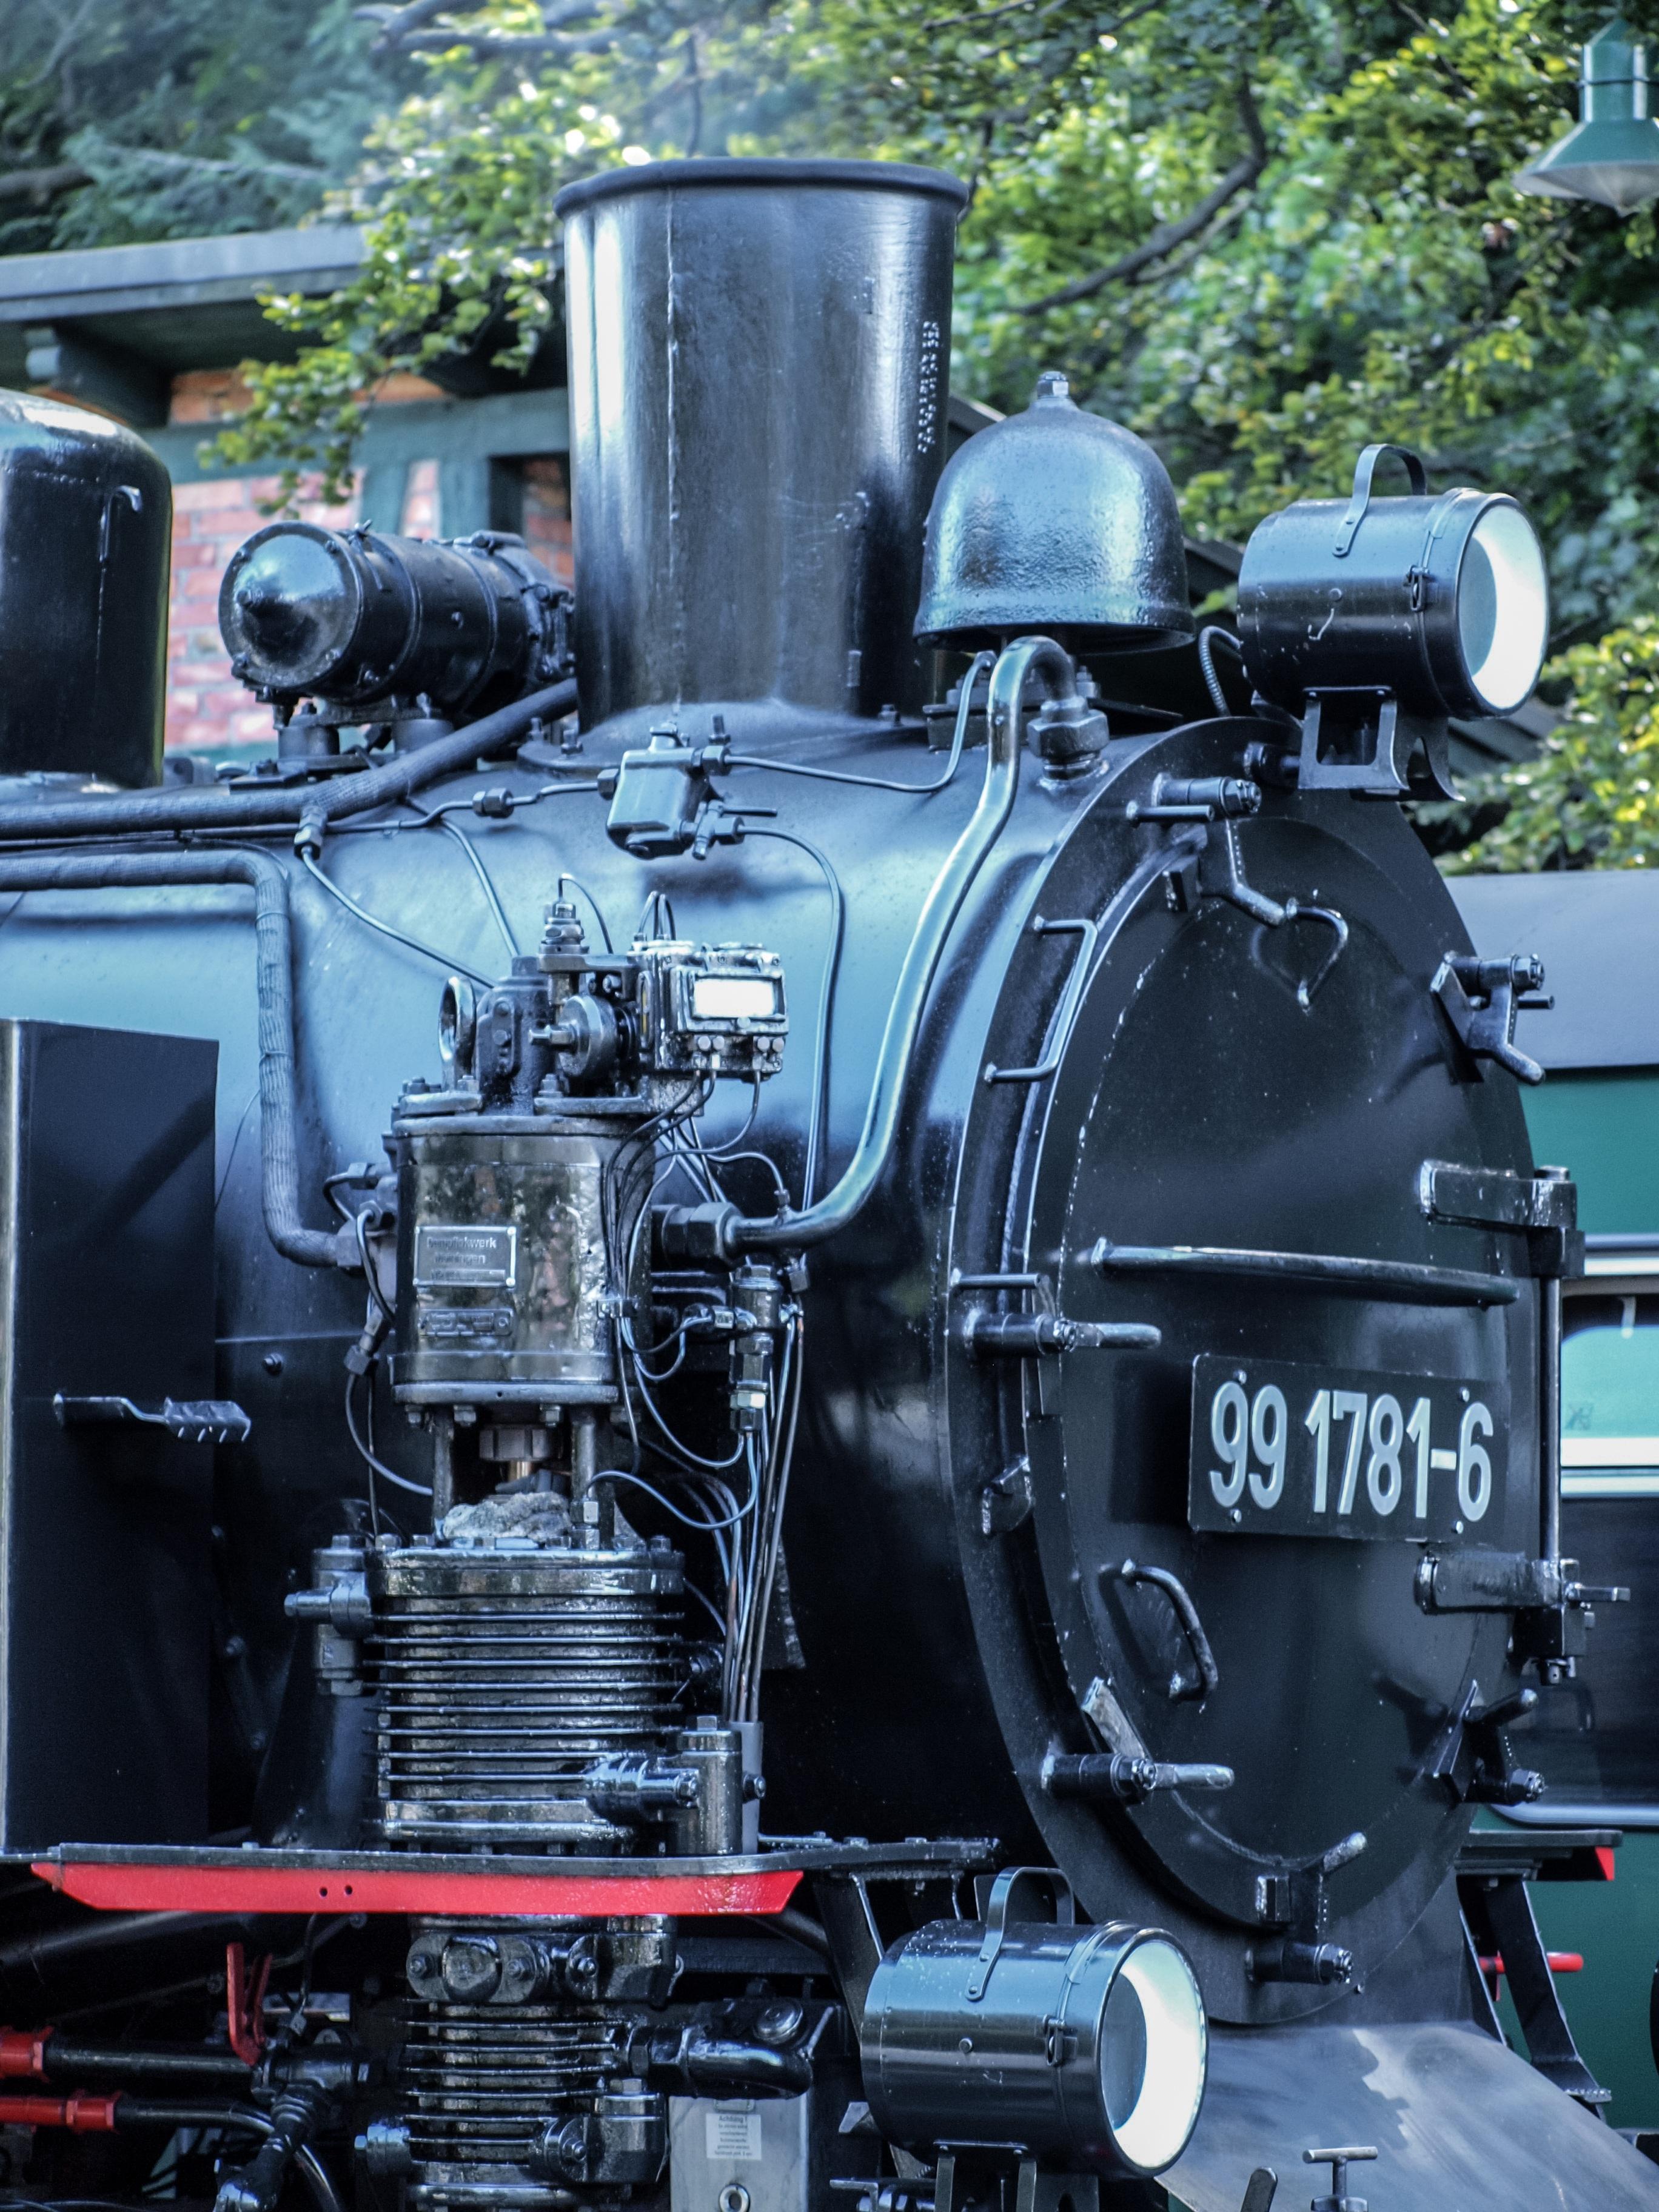 technology railway tractor old train transport vehicle drive locomotive engine loco nostalgic steam engine historically steam